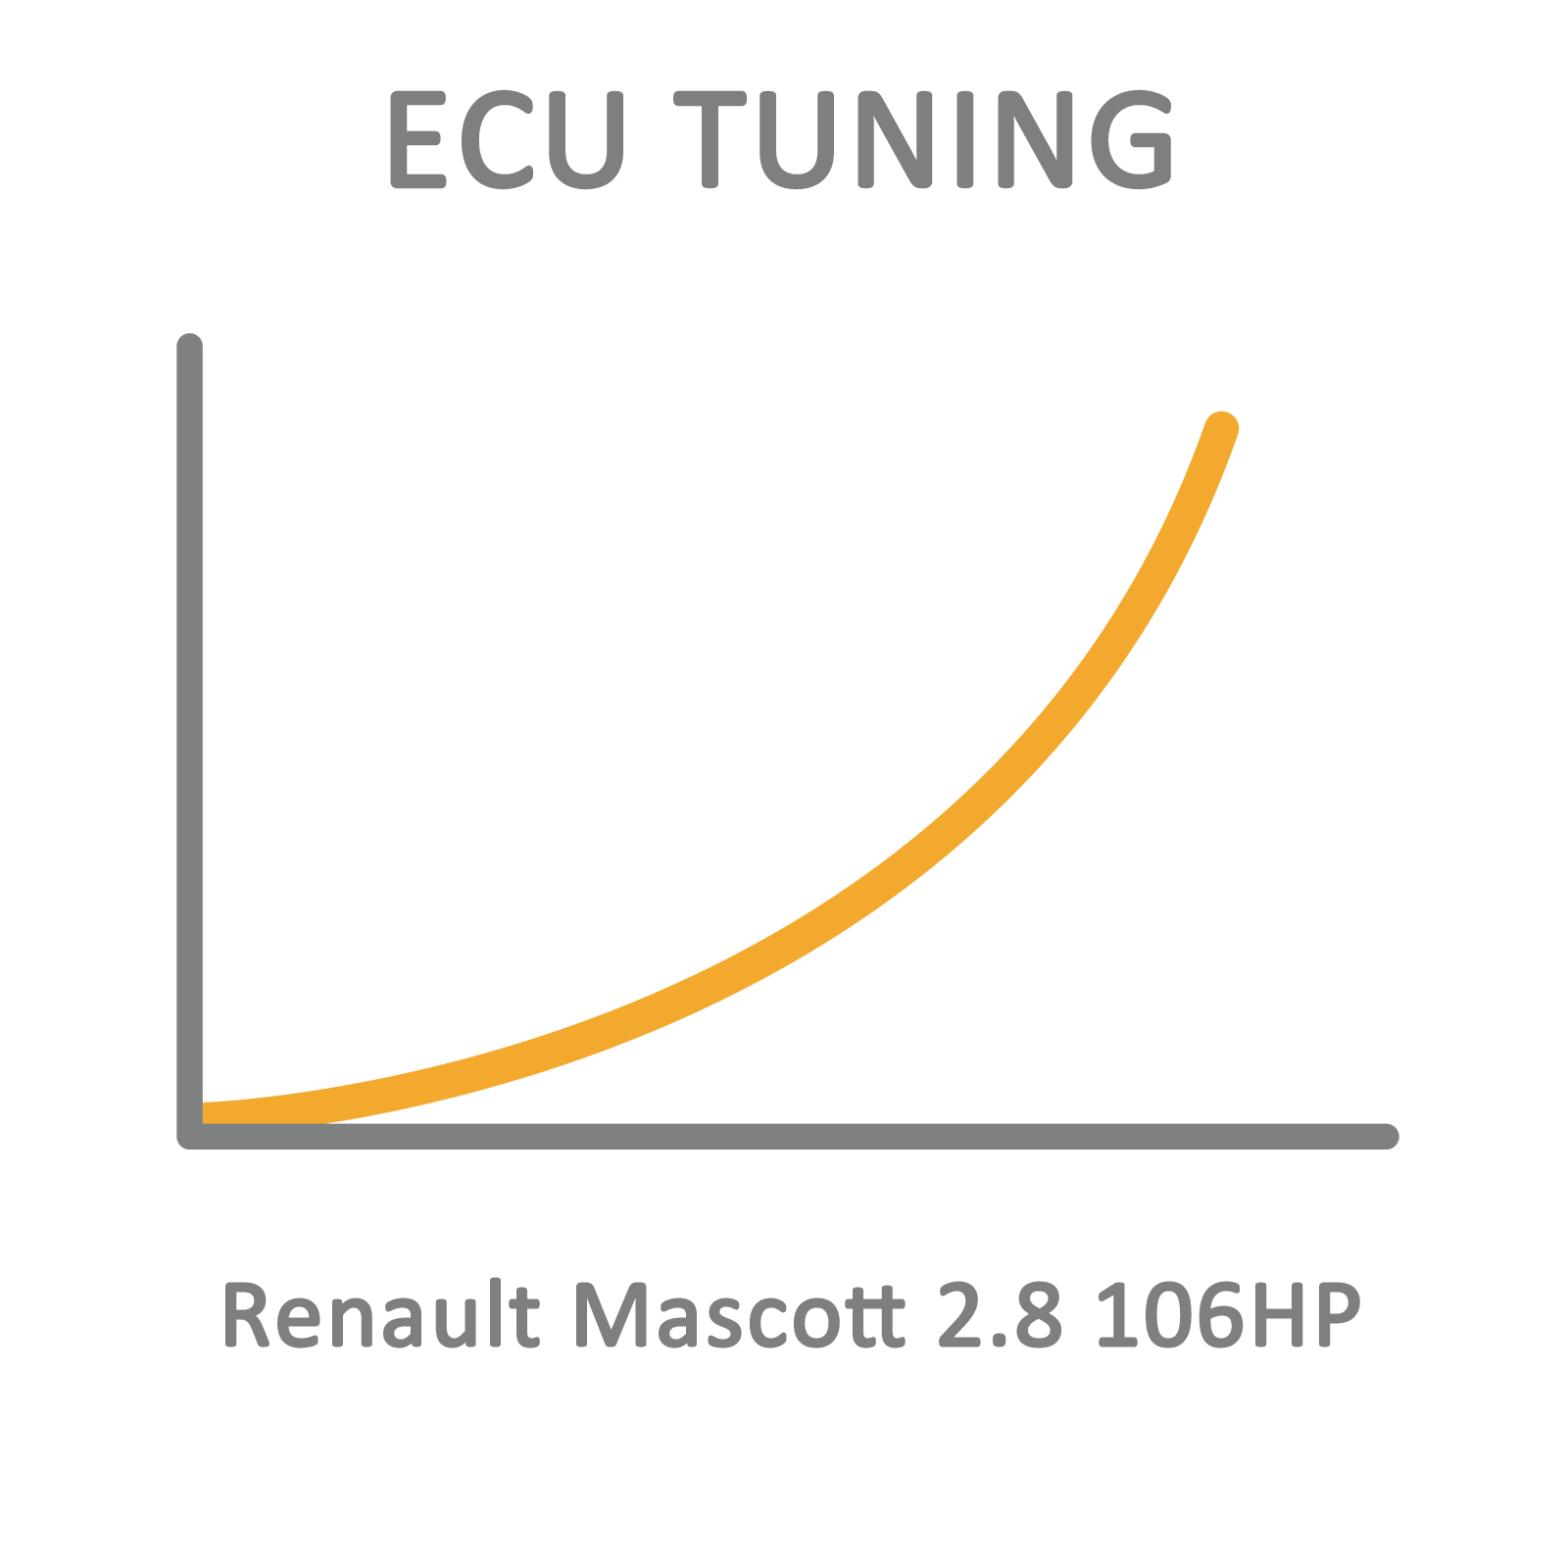 Renault Mascott 2.8 106HP ECU Tuning Remapping Programming